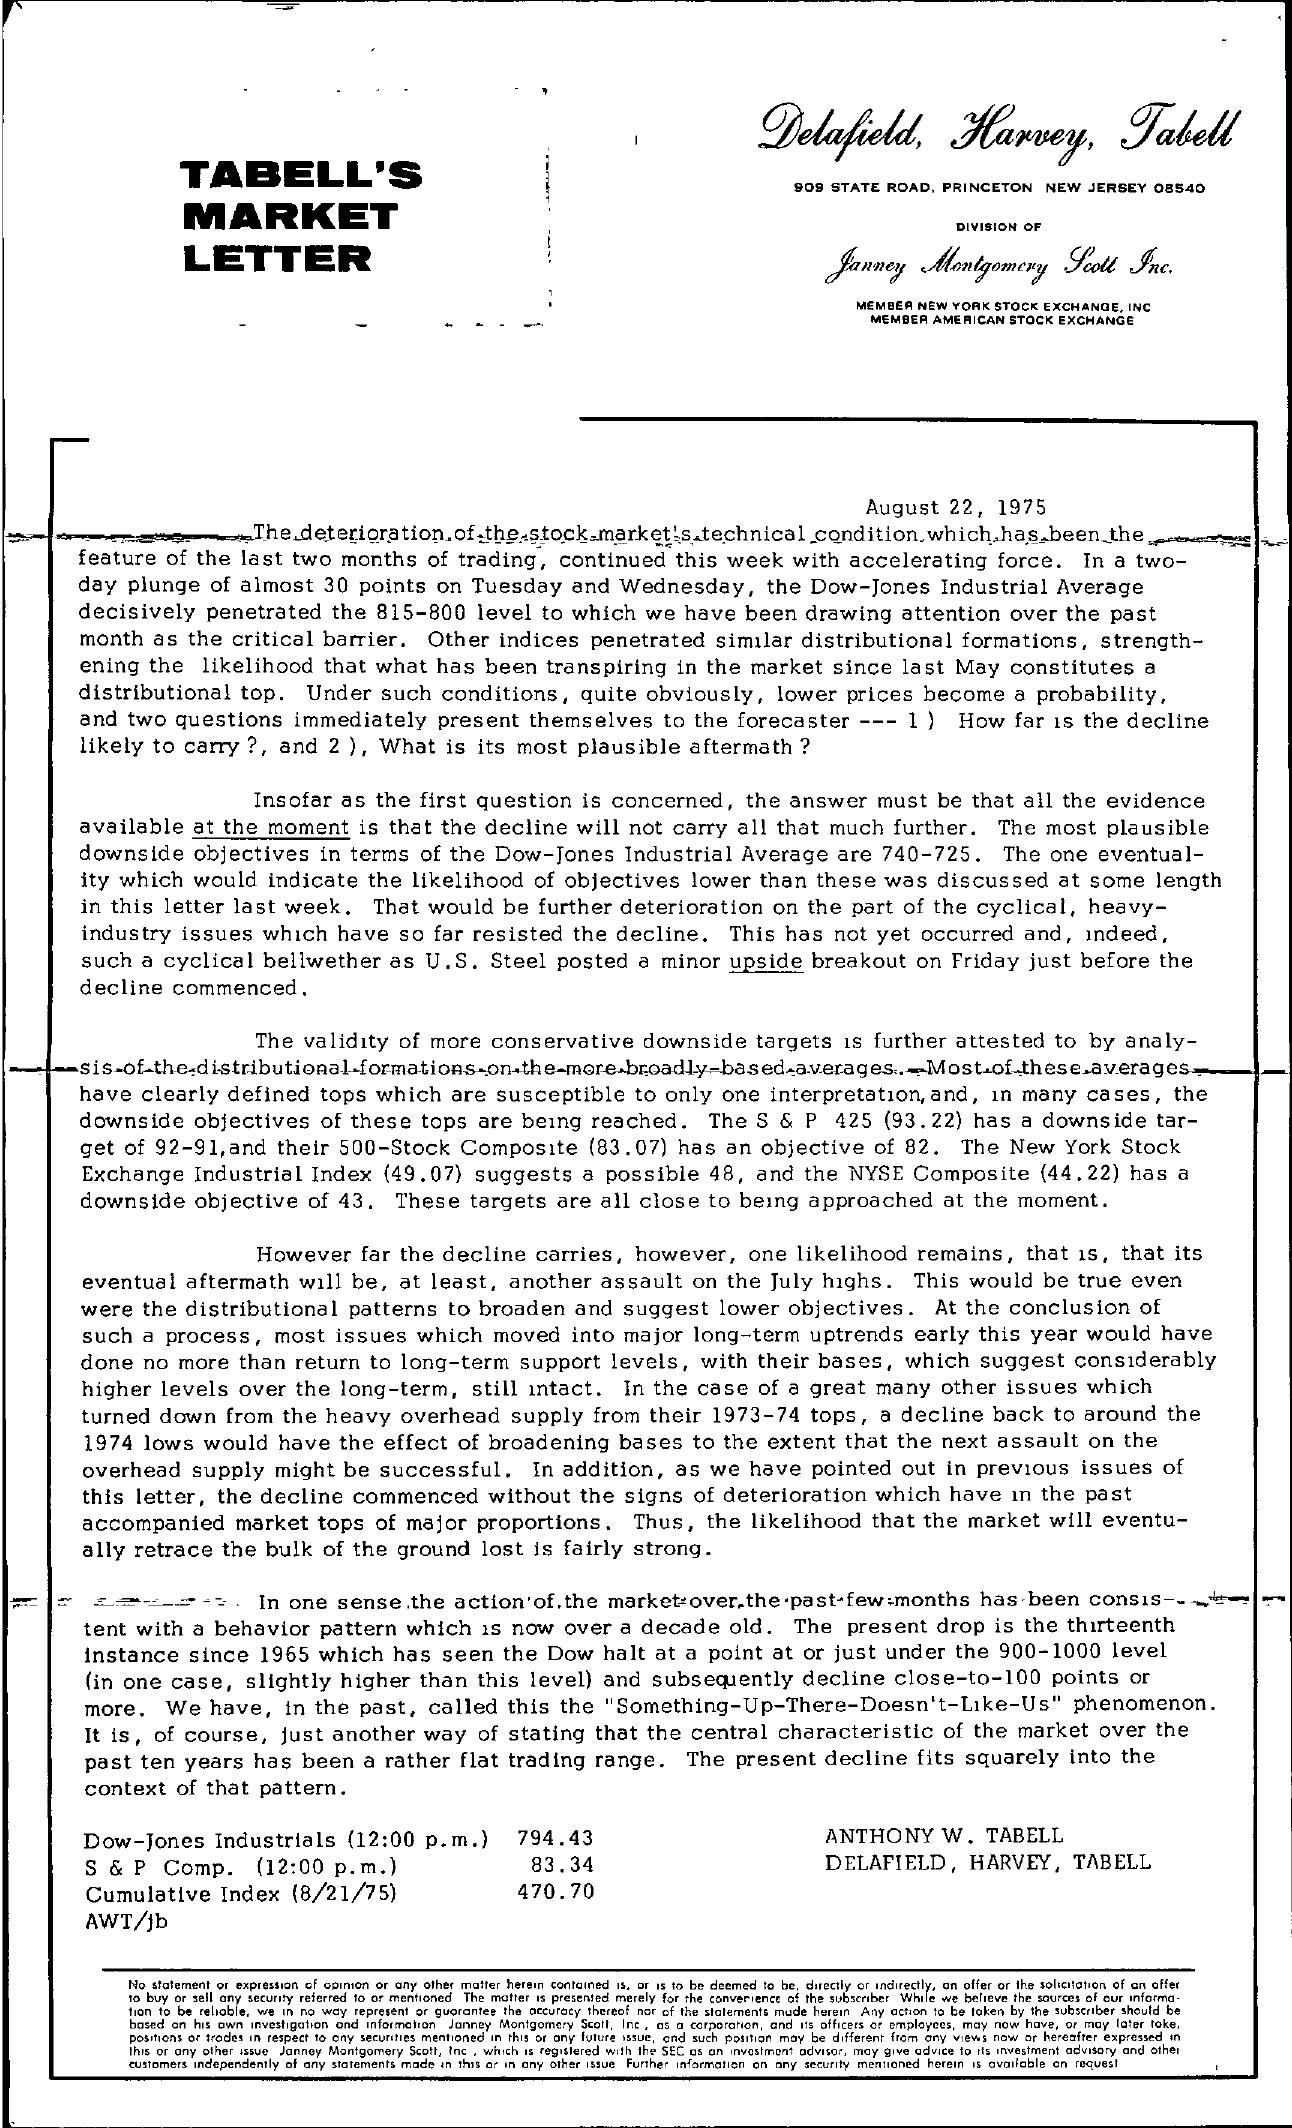 Tabell's Market Letter - August 22, 1975